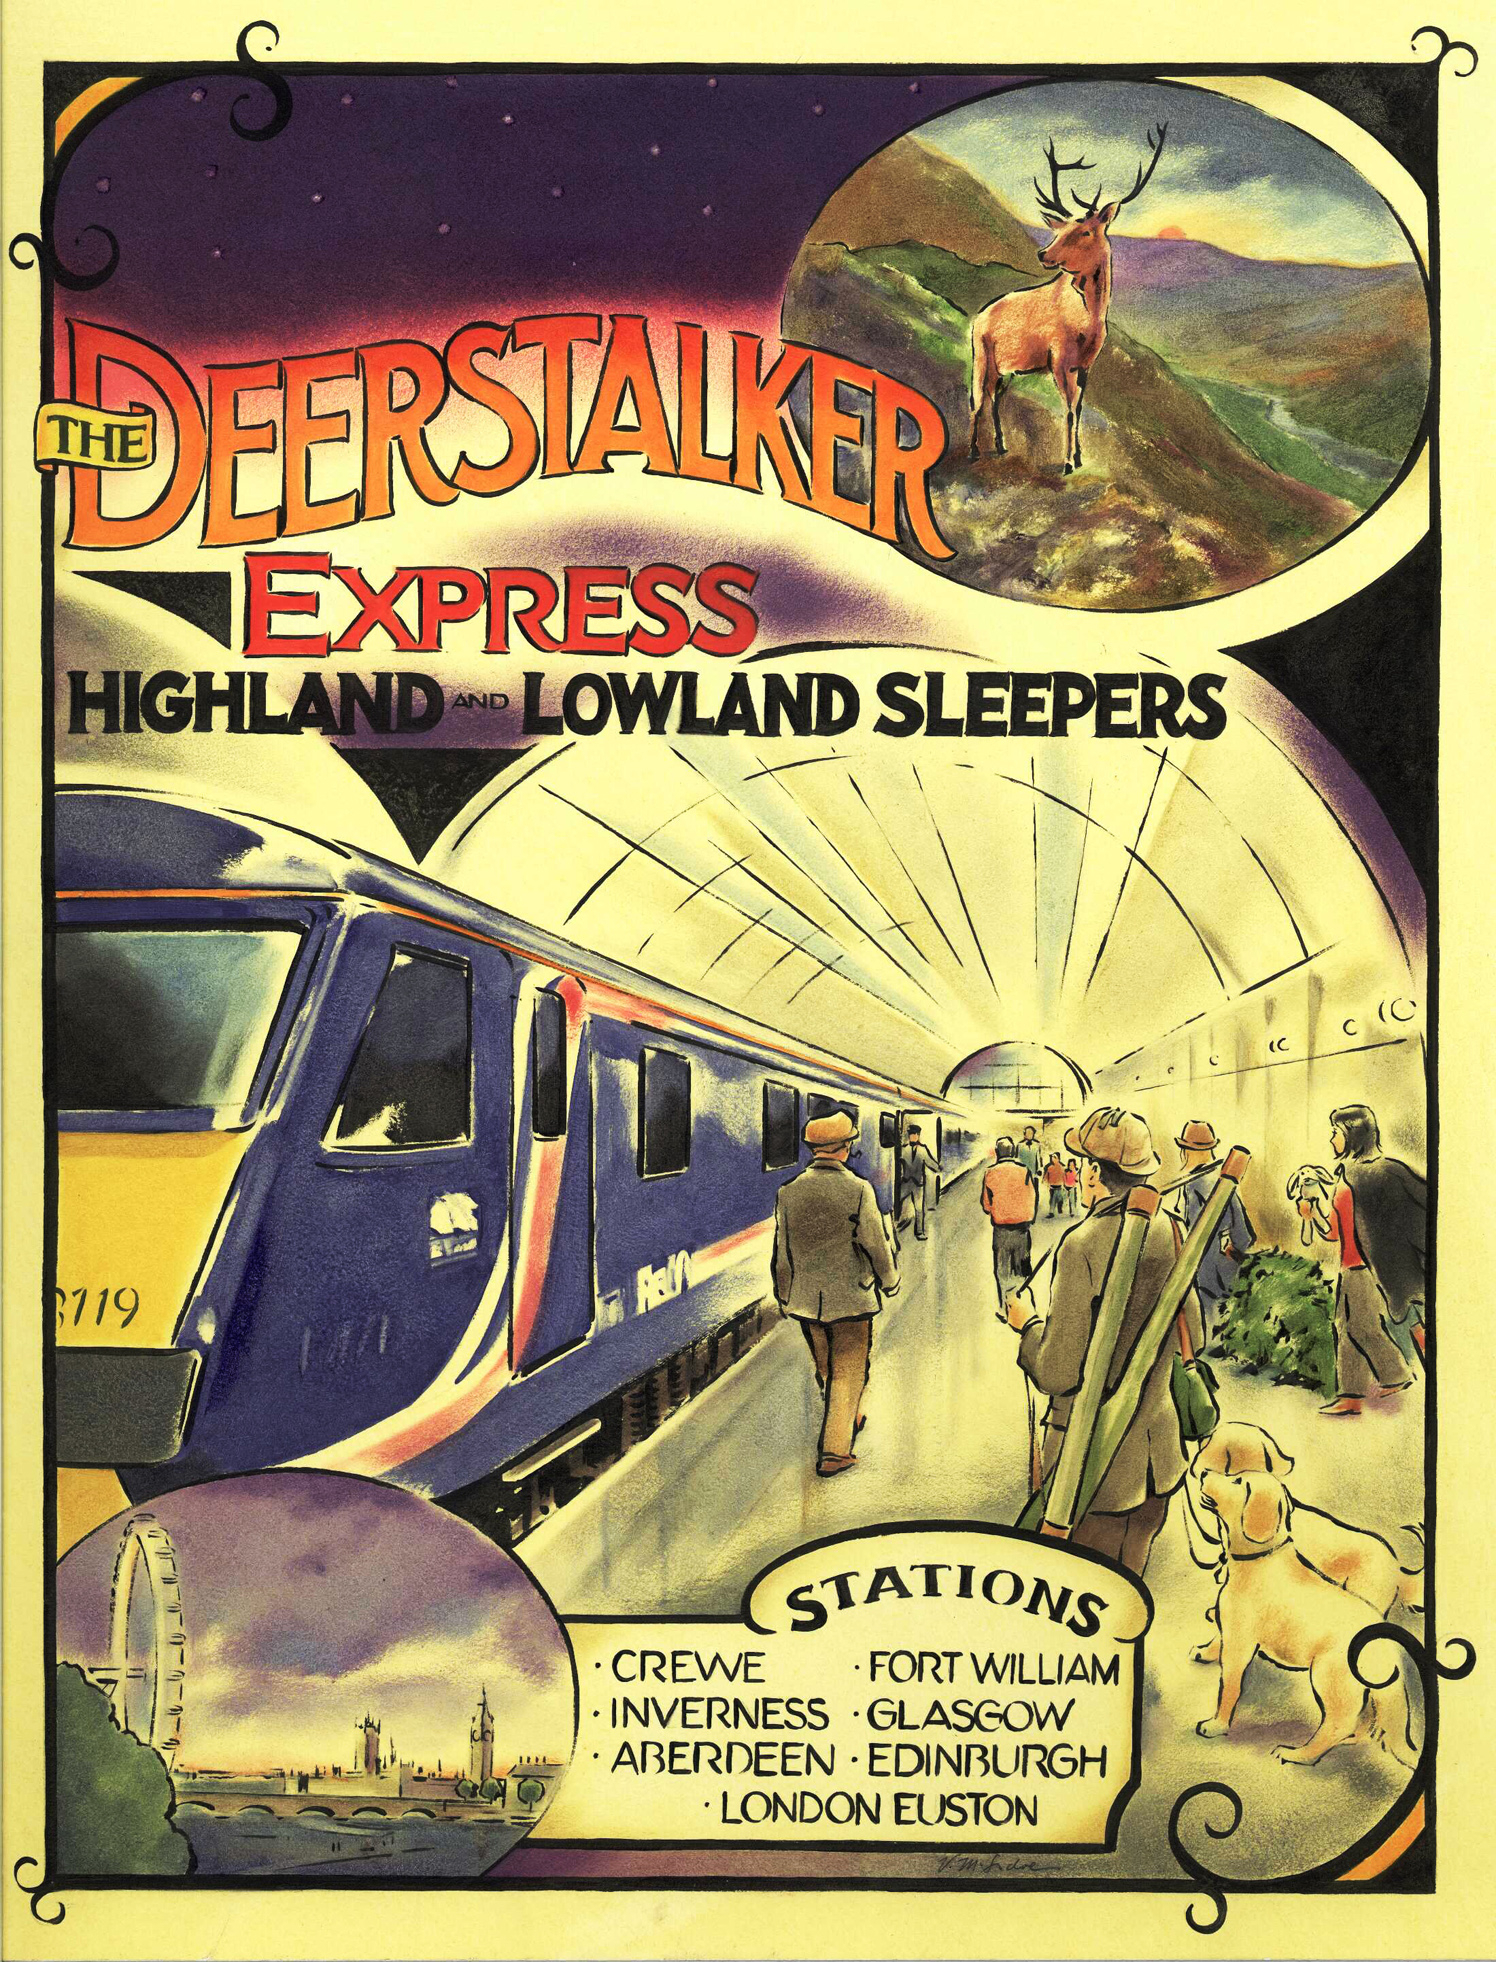 The Deerstalker Express